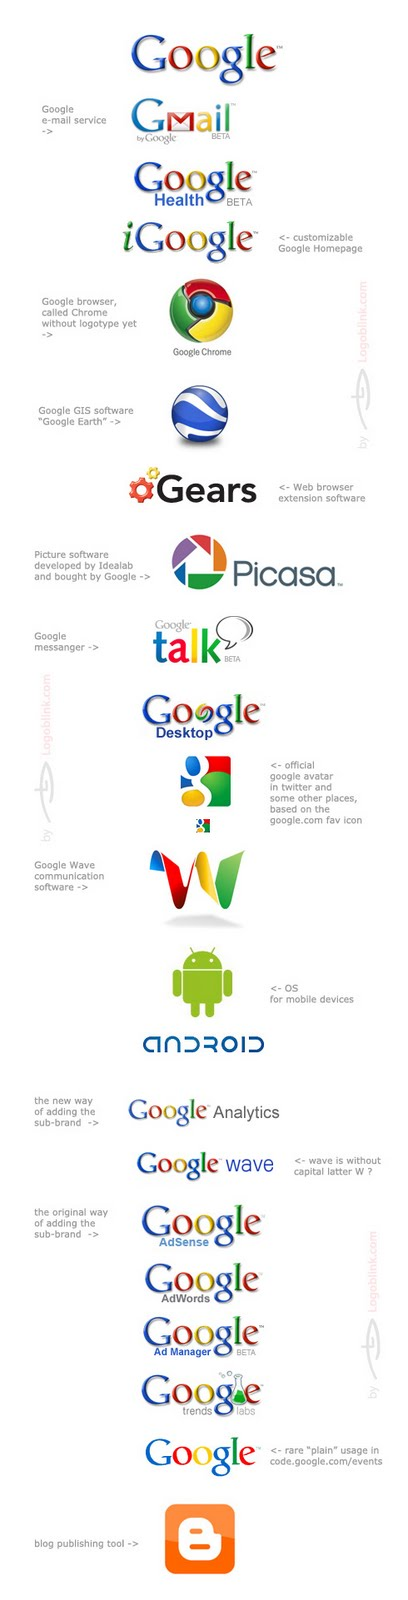 [google-logos.jpg]